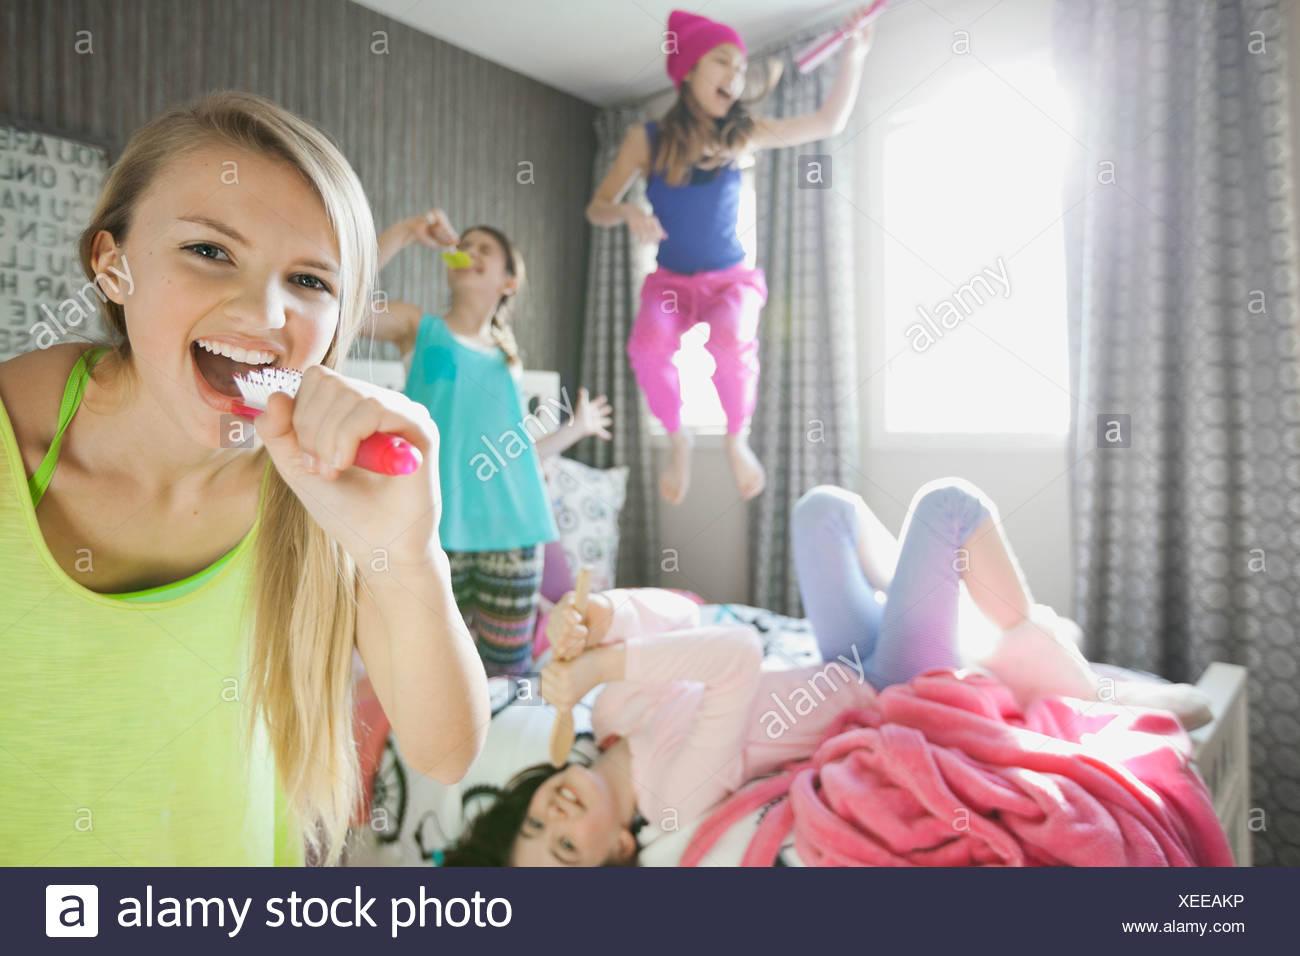 Girl singing into hairbrush at slumber party Photo Stock